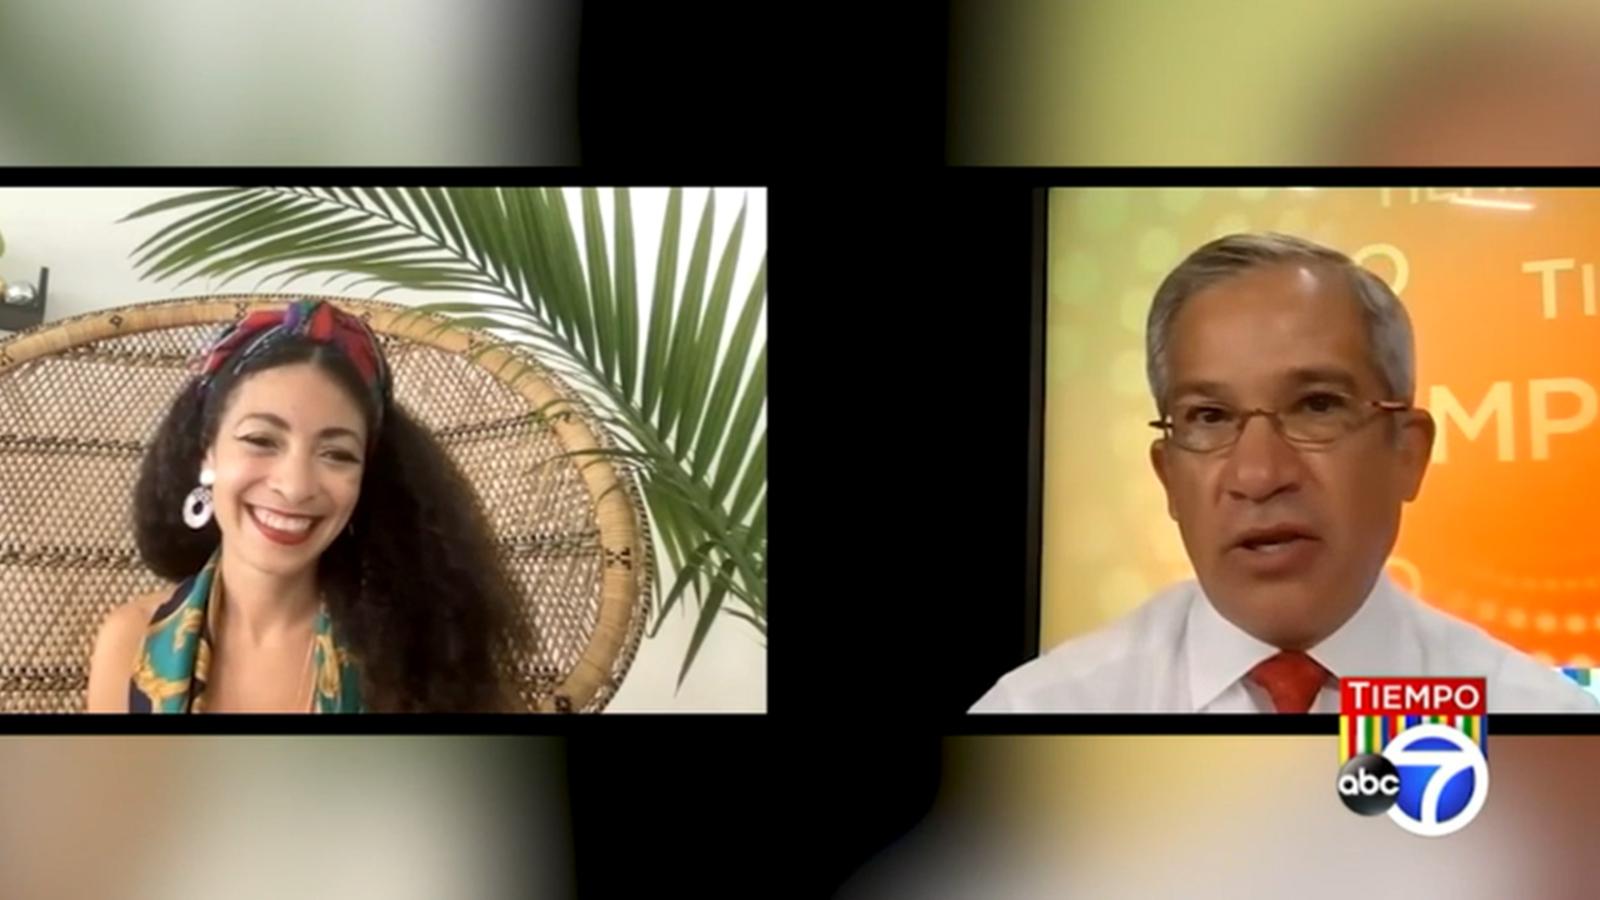 Tiempo with Joe Torres: Celebrating Hispanic Heritage Month through art - WABC-TV